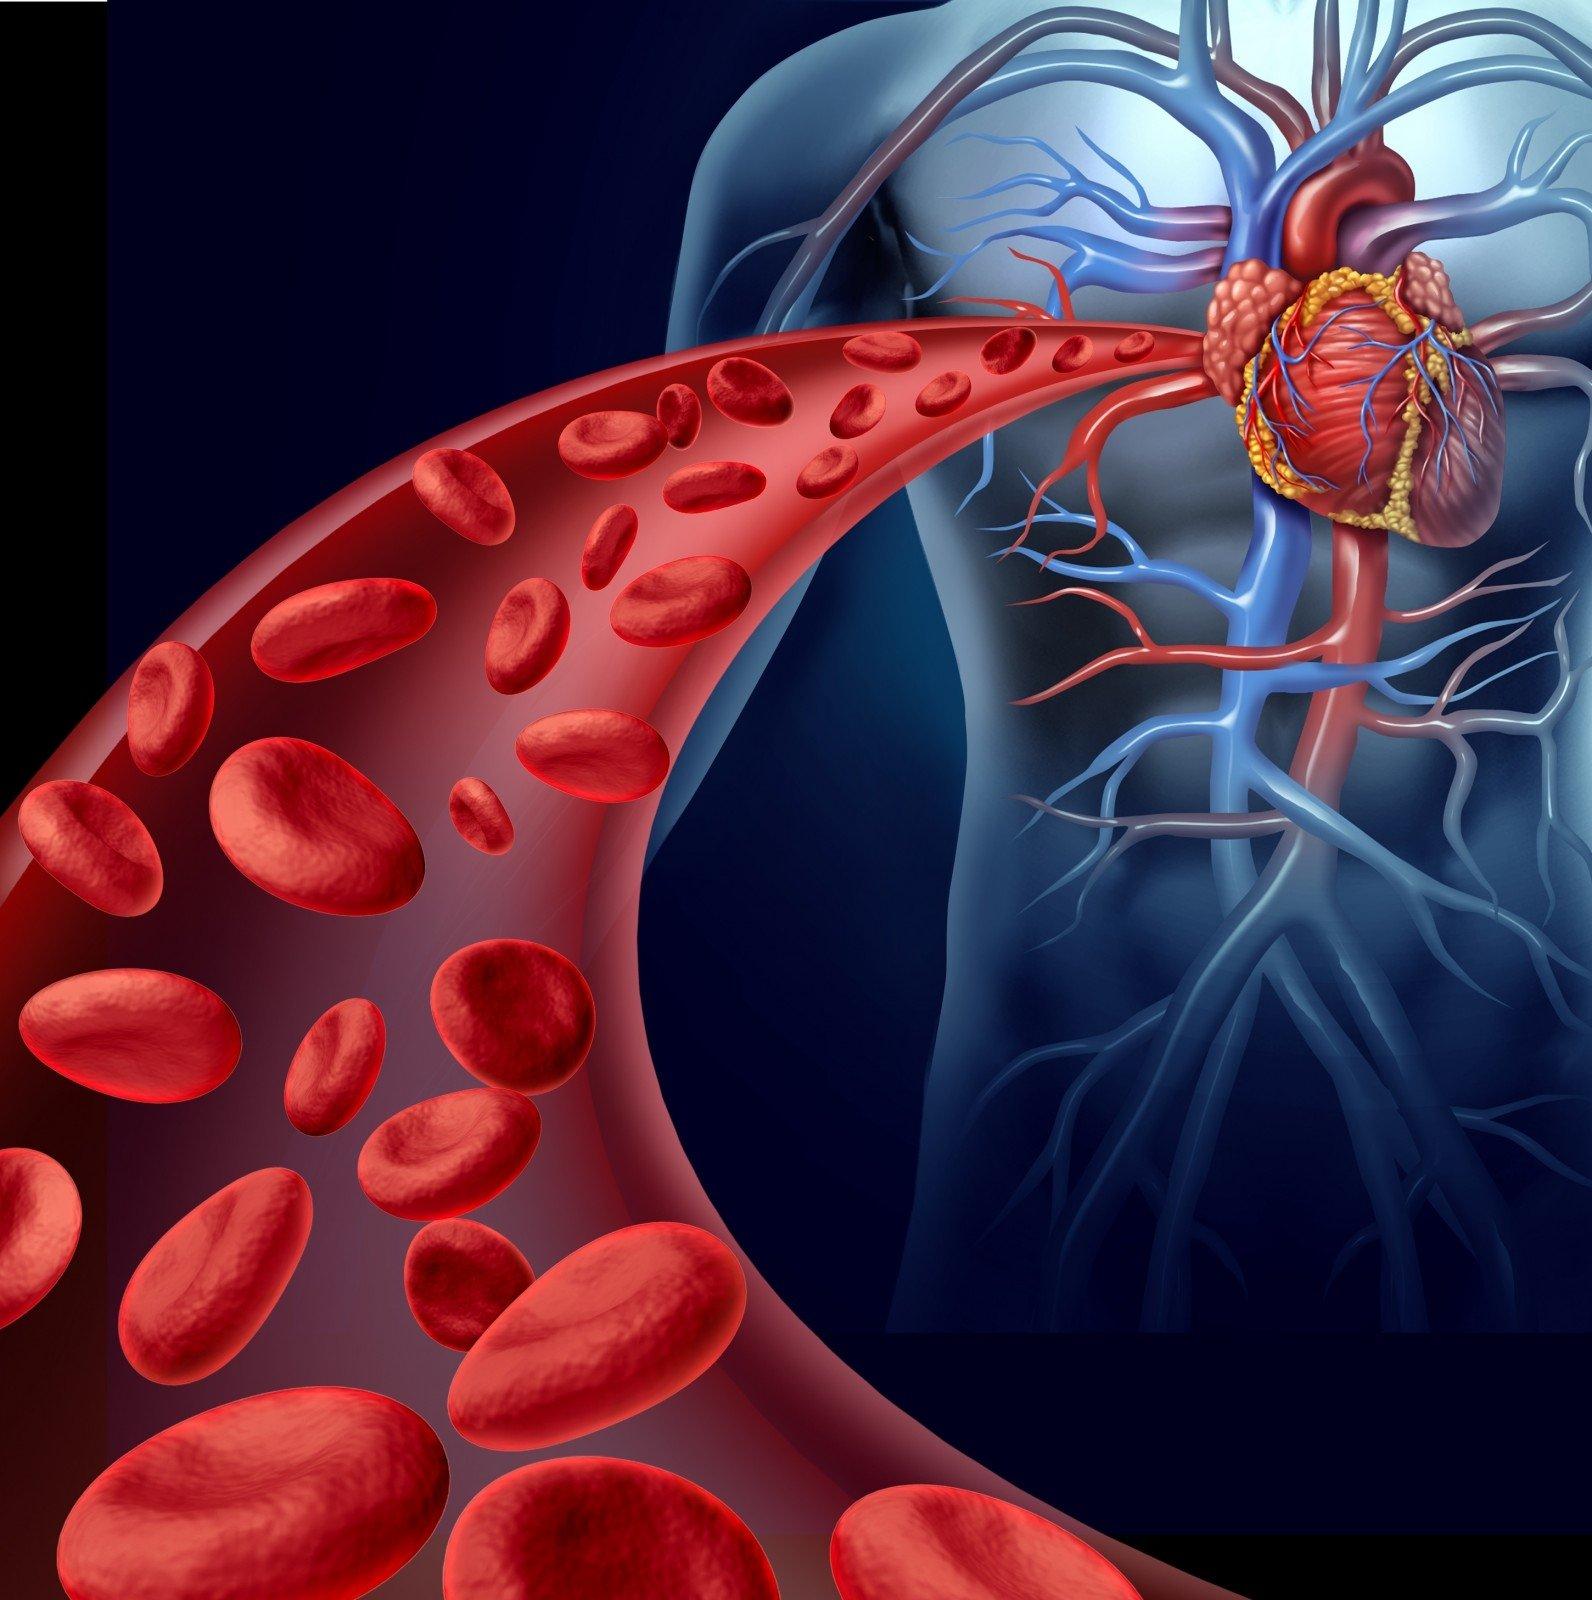 hipertenziją gydome be tablečių per dieną